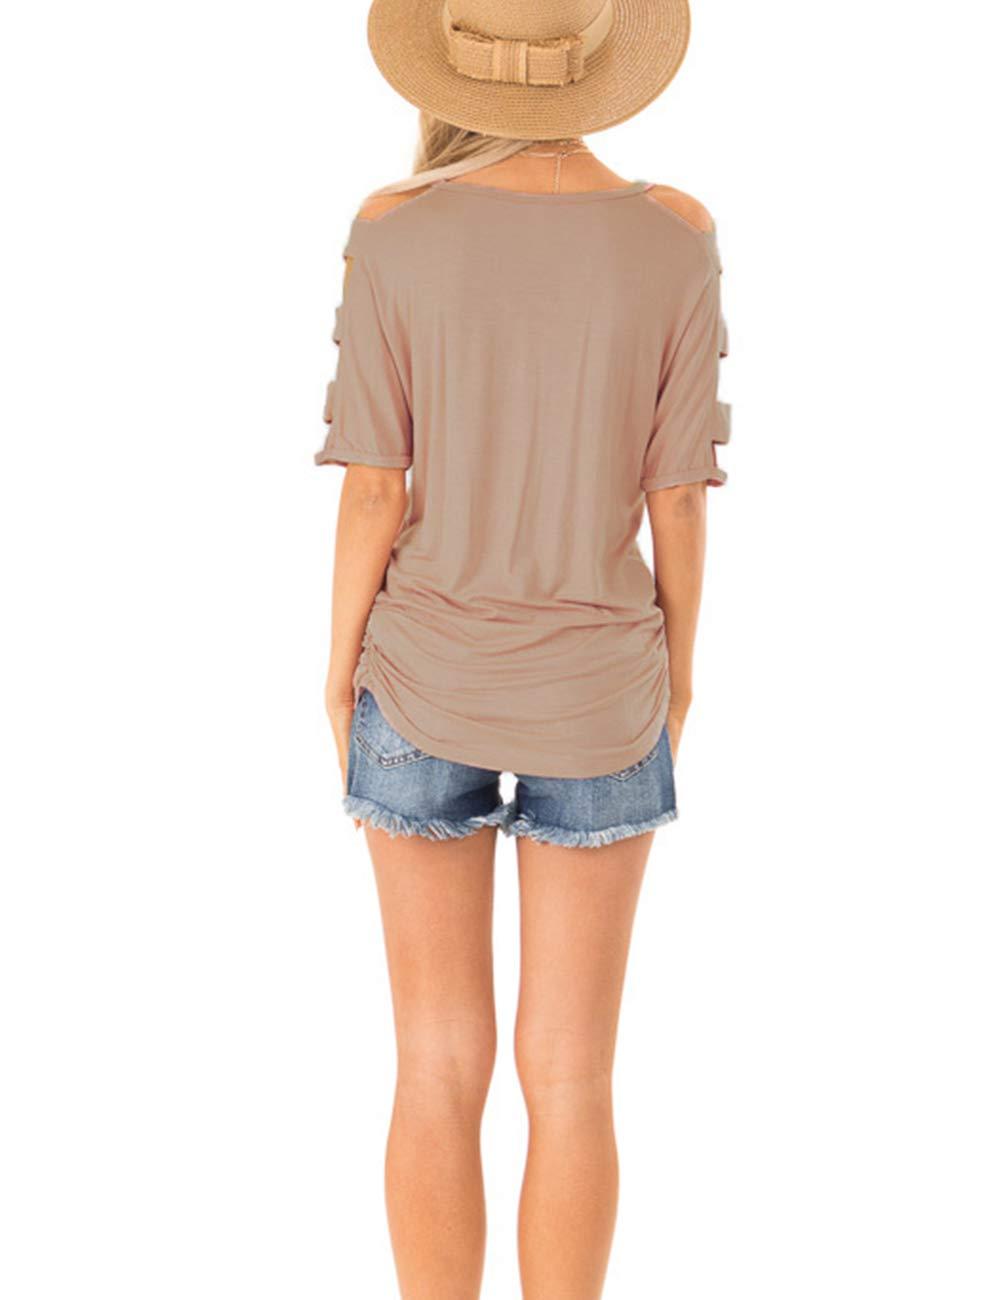 Eanklosco Womens Summer Short Sleeve Cold Shoulder Tops V Neck Basic T Shirts (Light Coffe, L)